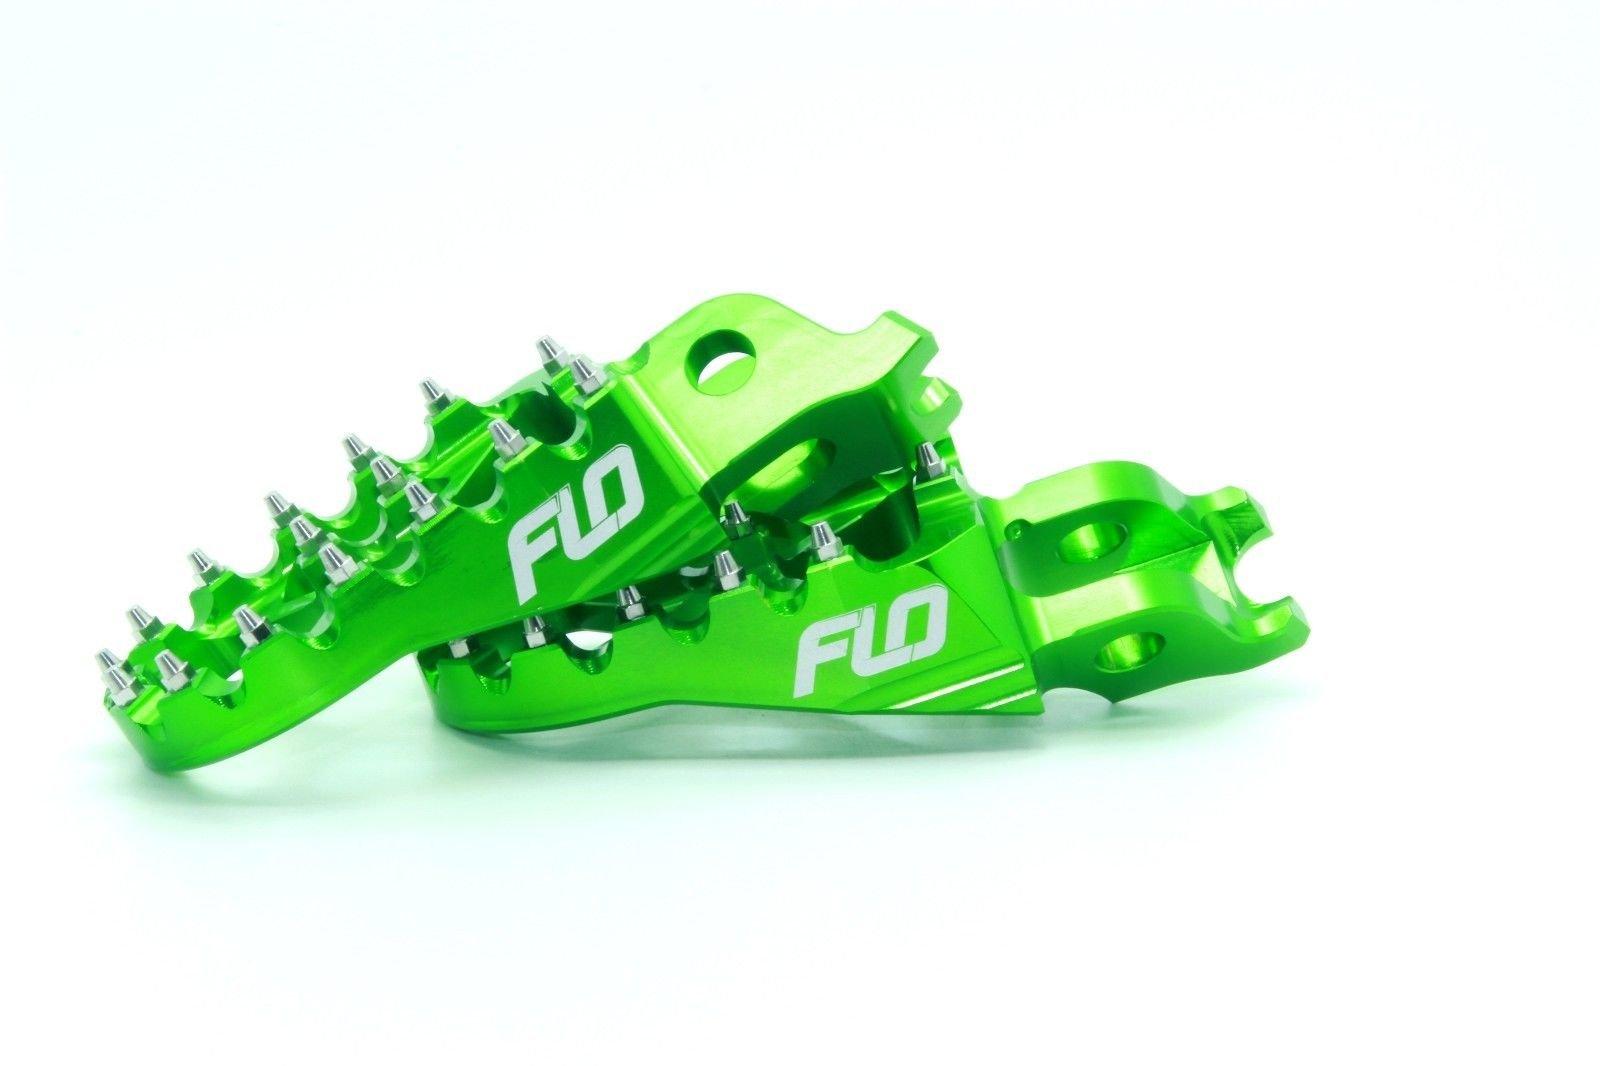 Flo Motorsports Green Kawasaki KXF250/450 Foot Pegs Fpeg-792Grn by Flo Motorsports (Image #4)